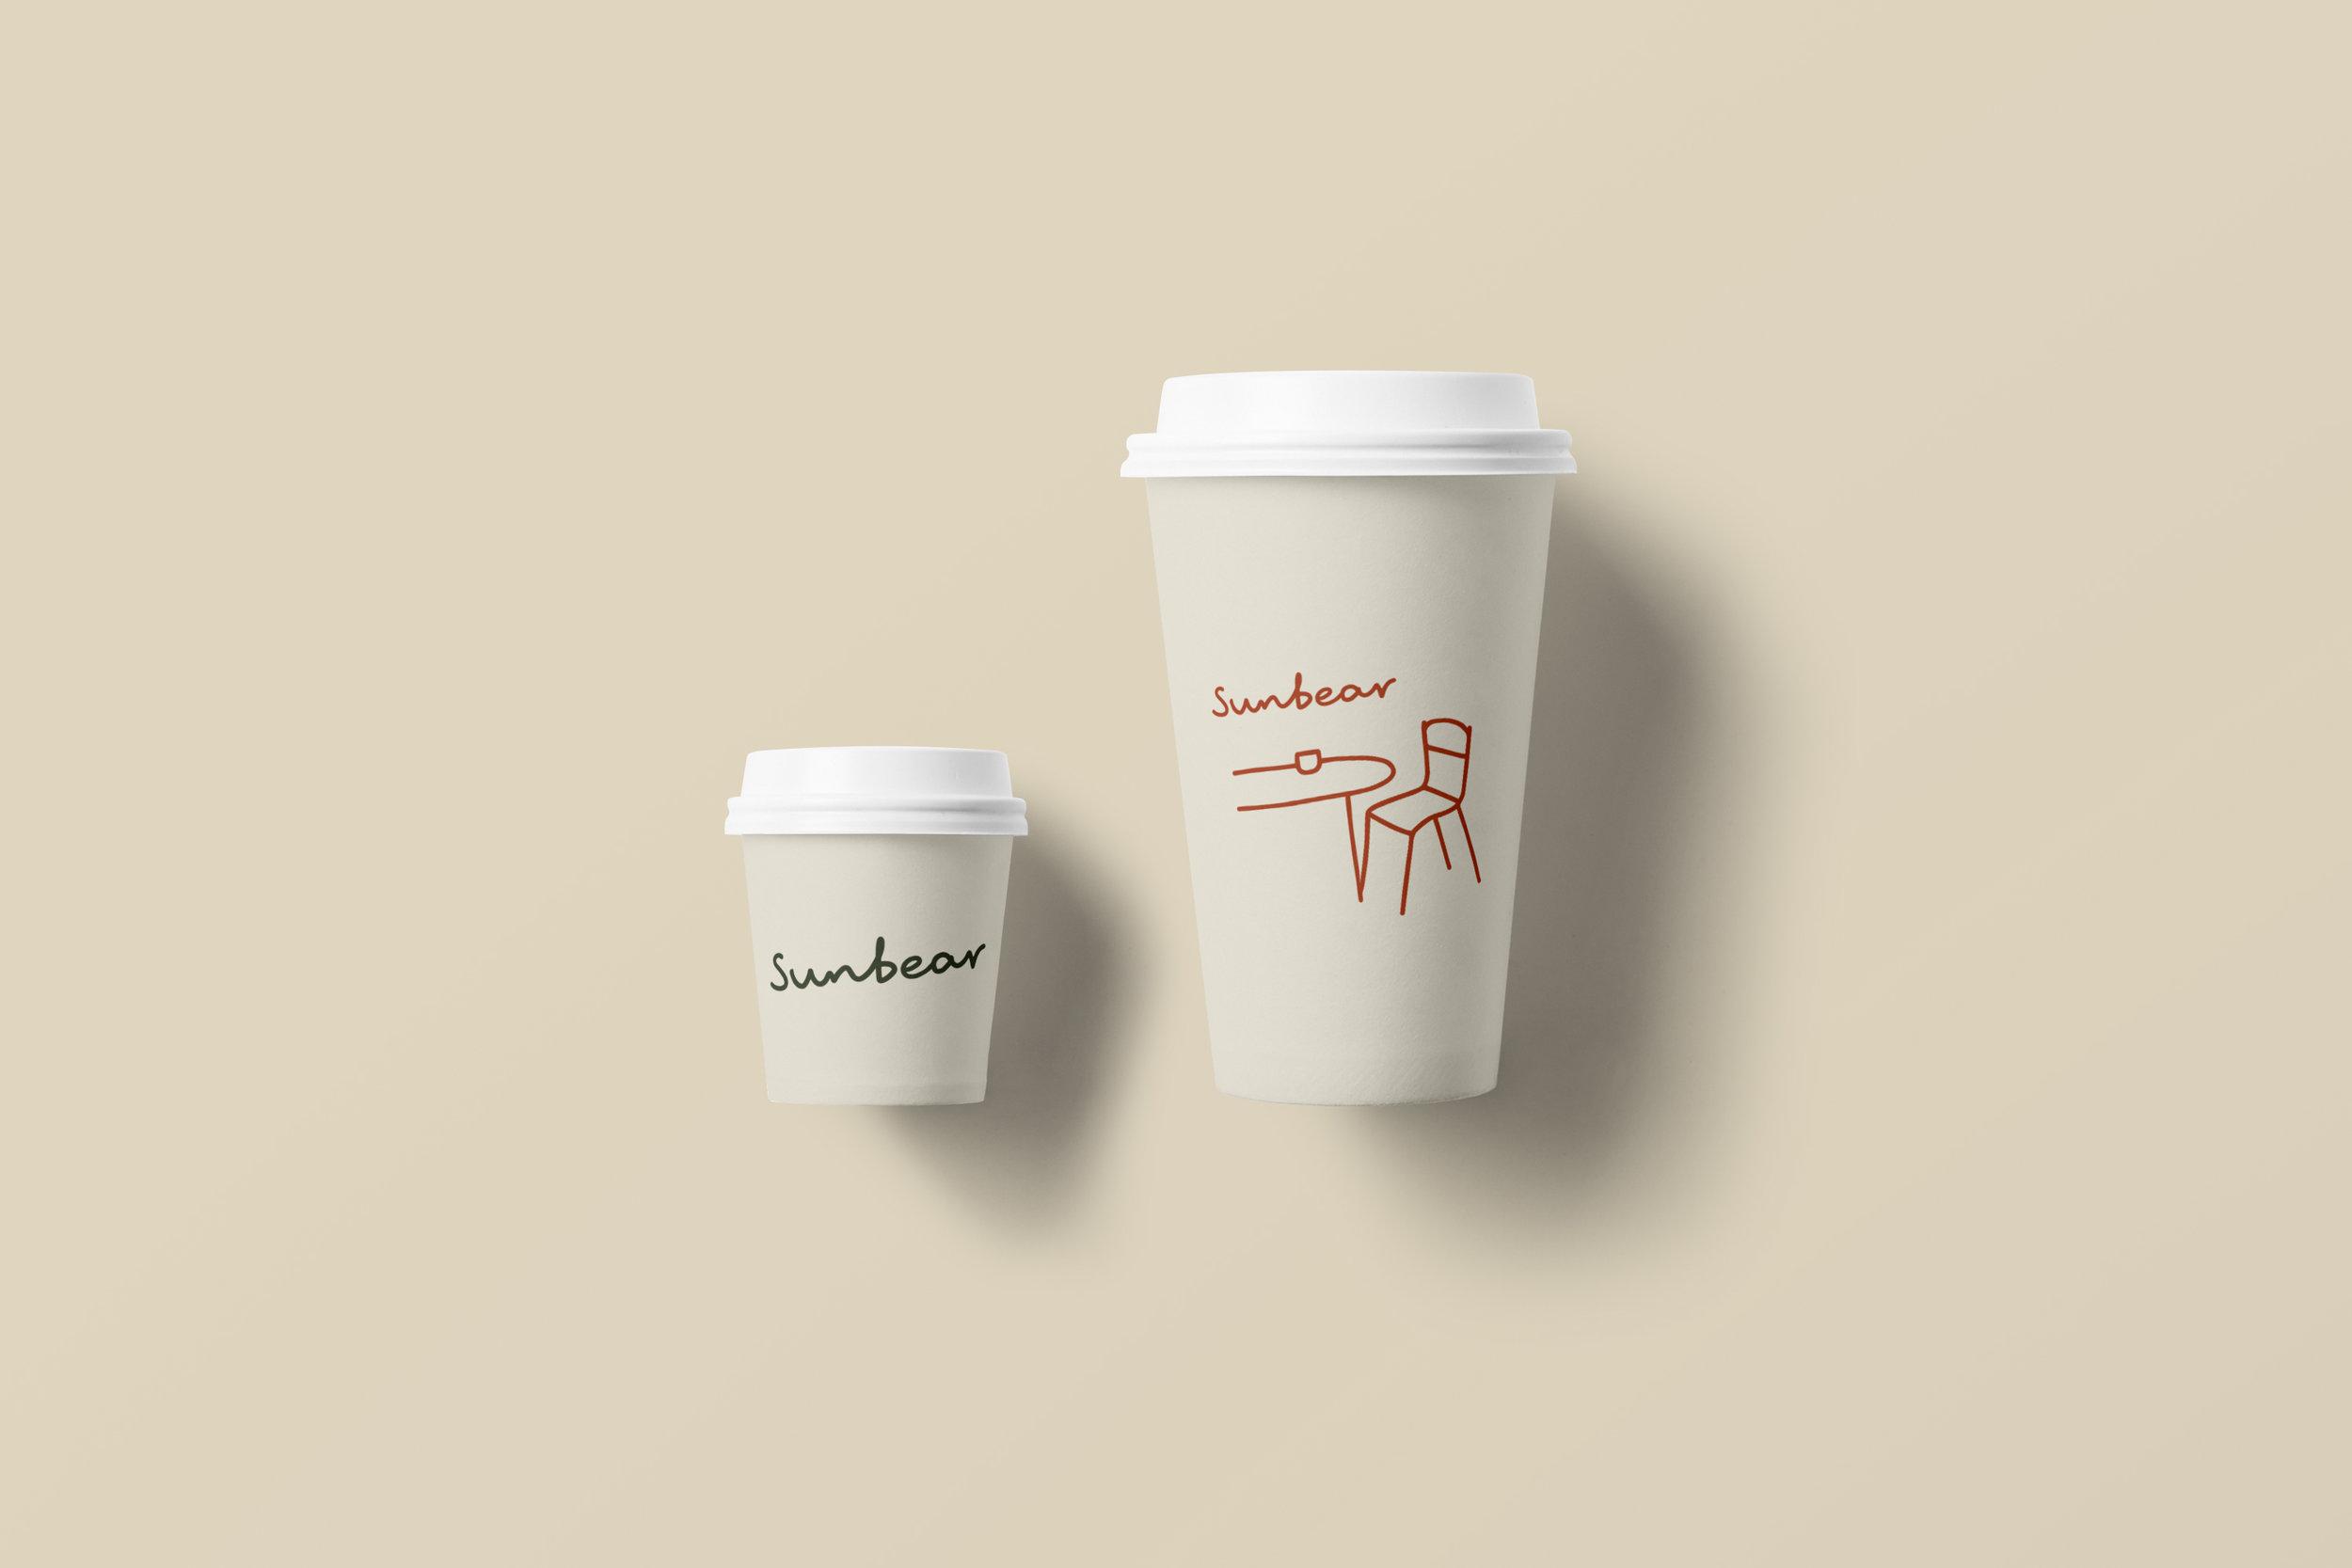 SUNBEAR_CUP-MOCK-UP.JPG